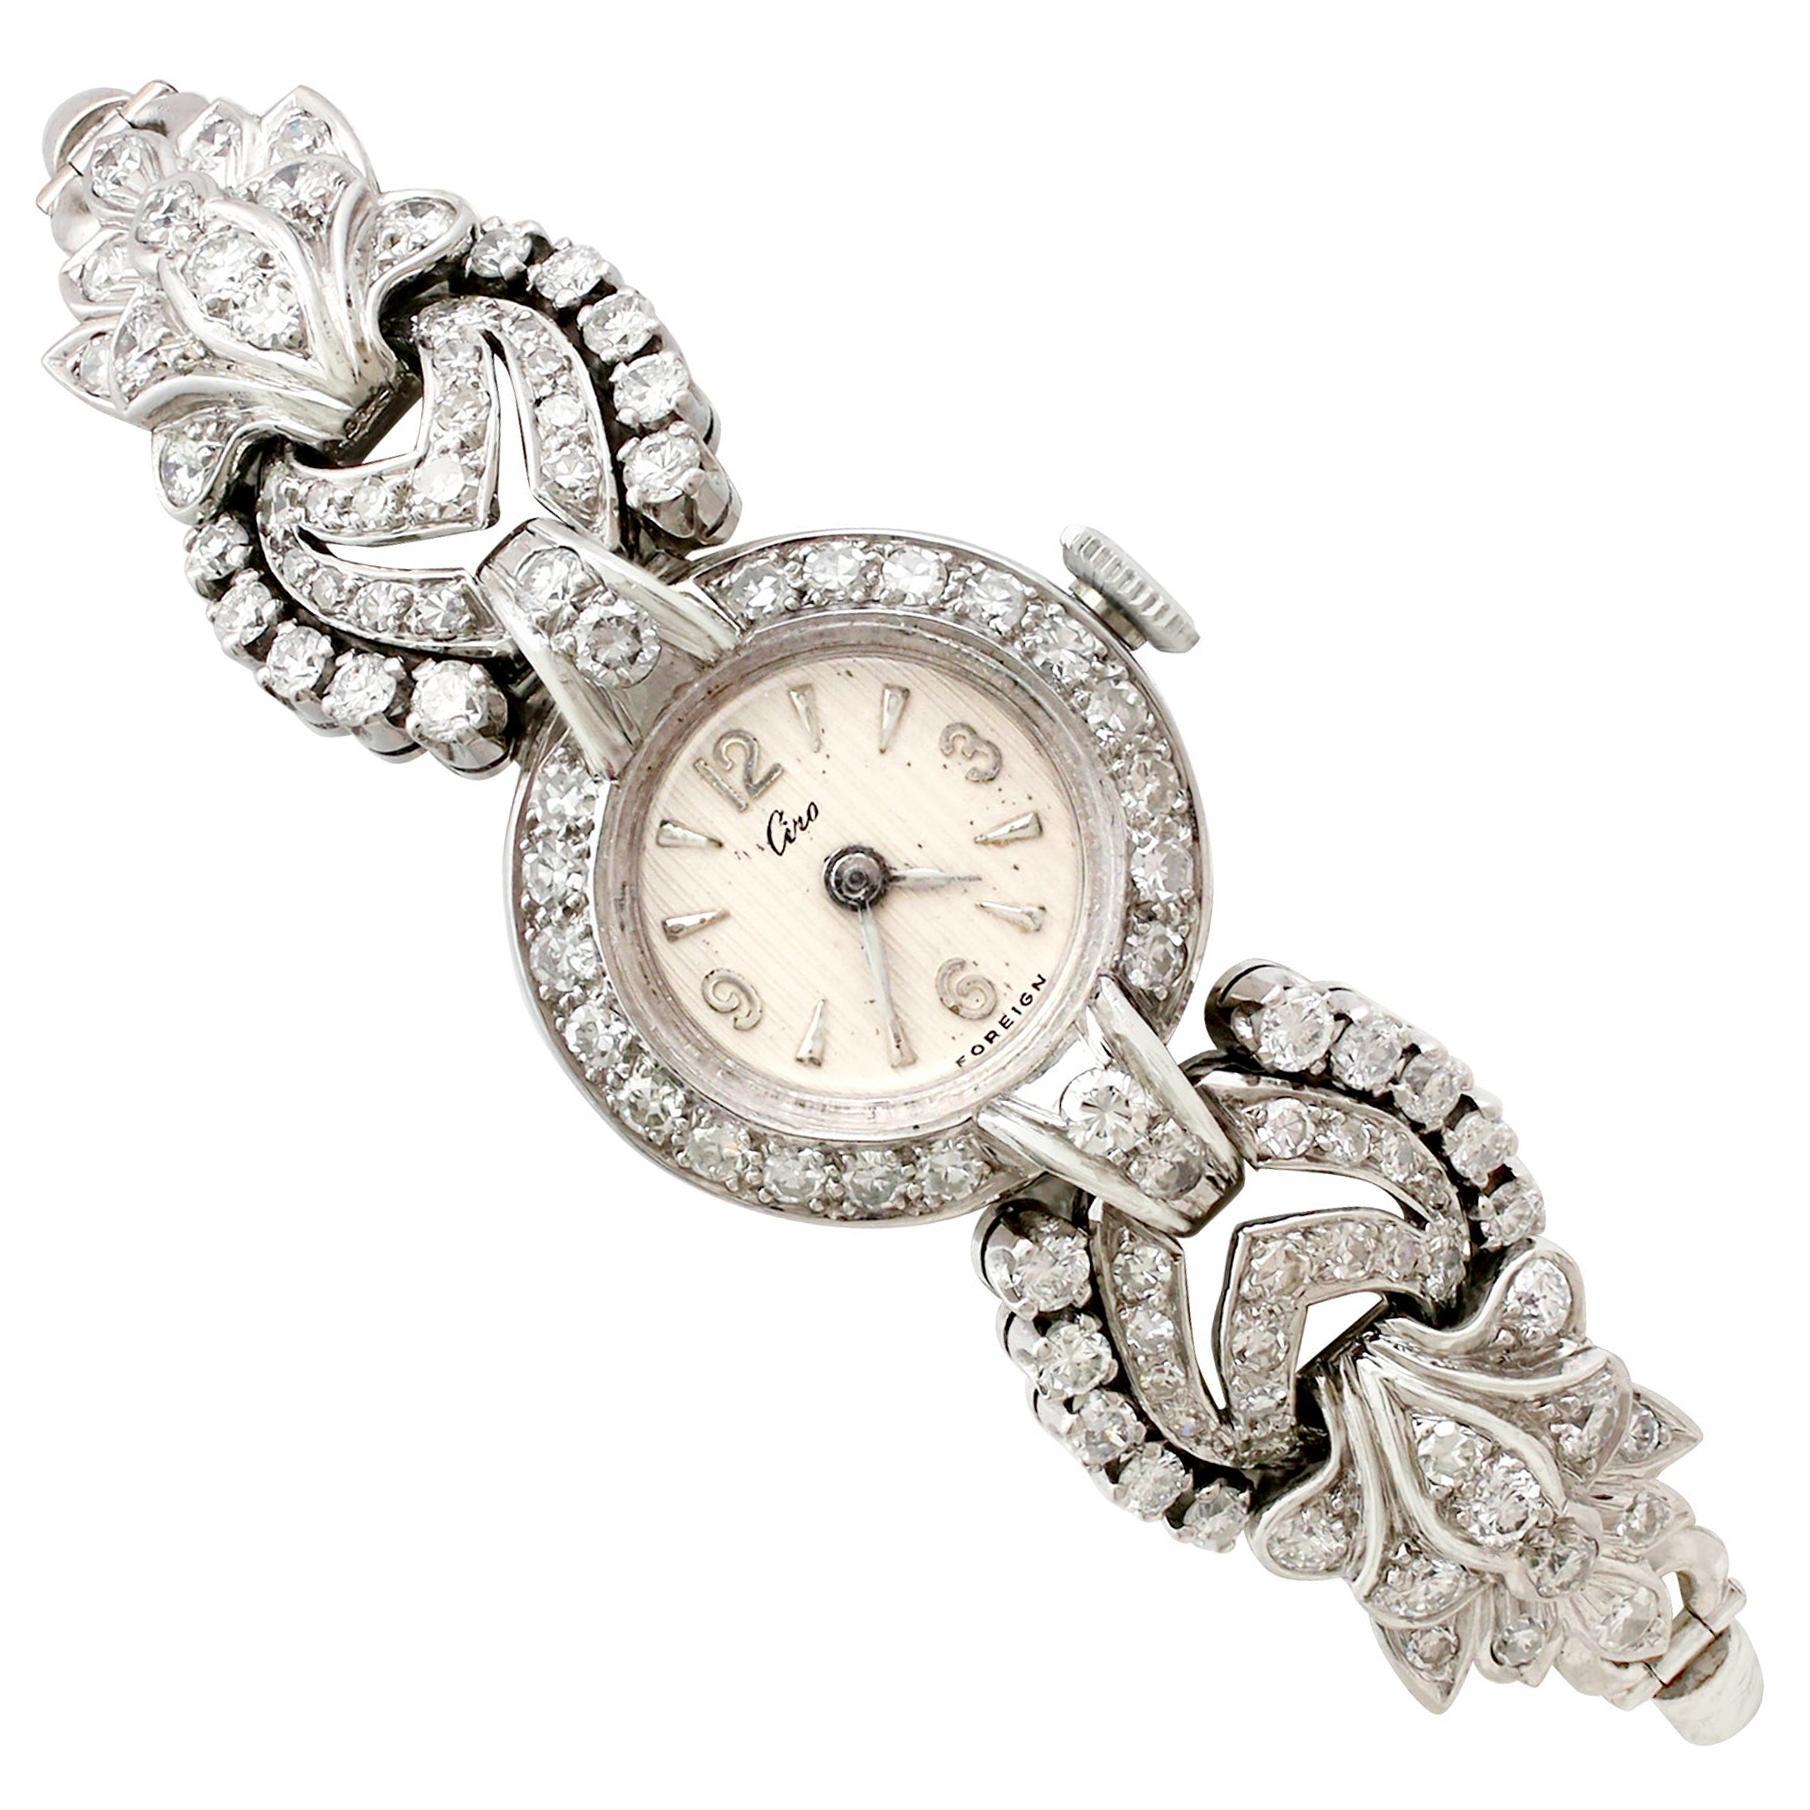 1950s 2.92 Carat Diamond and Platinum Cocktail Watch